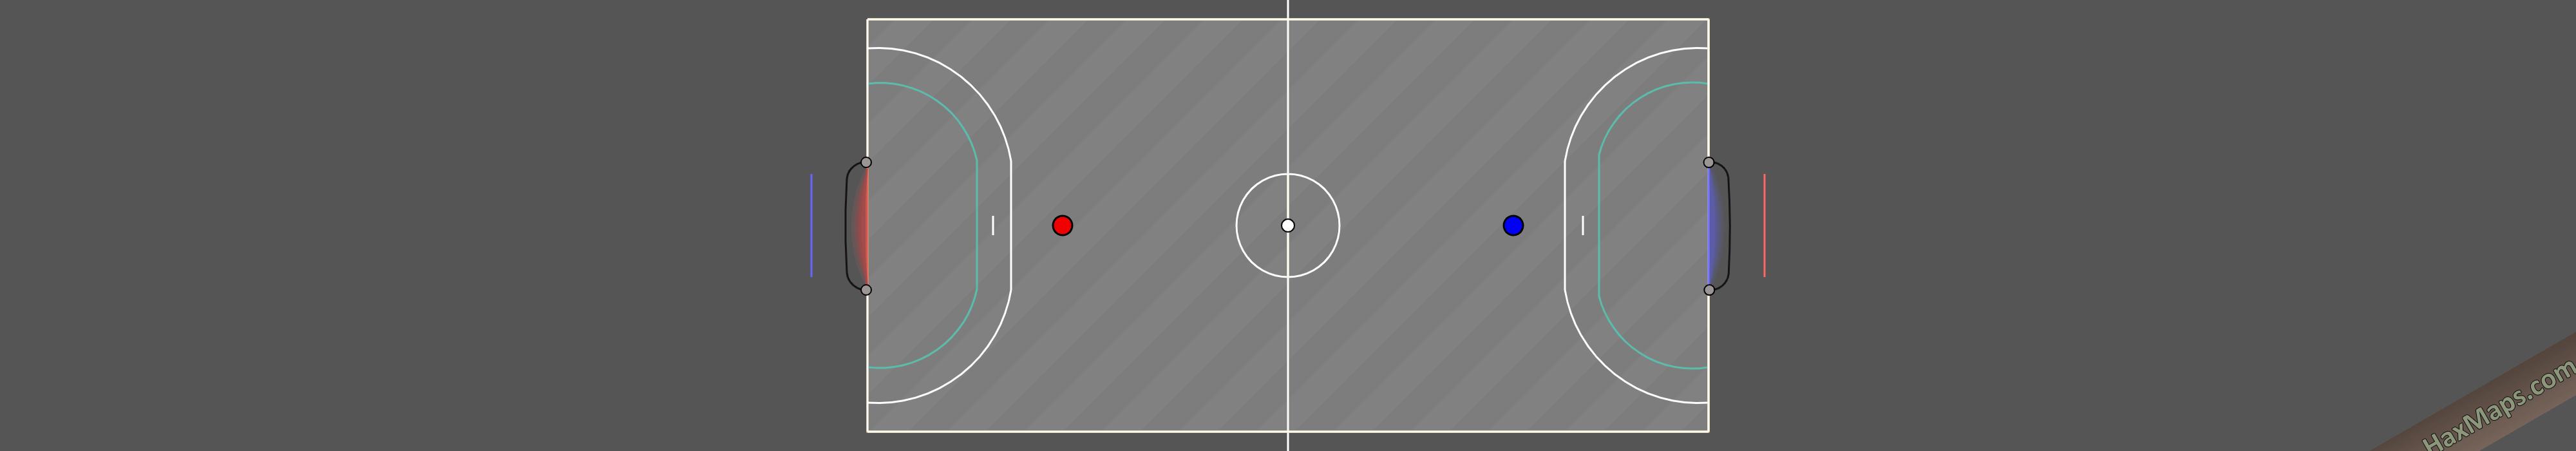 hax ball maps | Handball 2K19 GLH